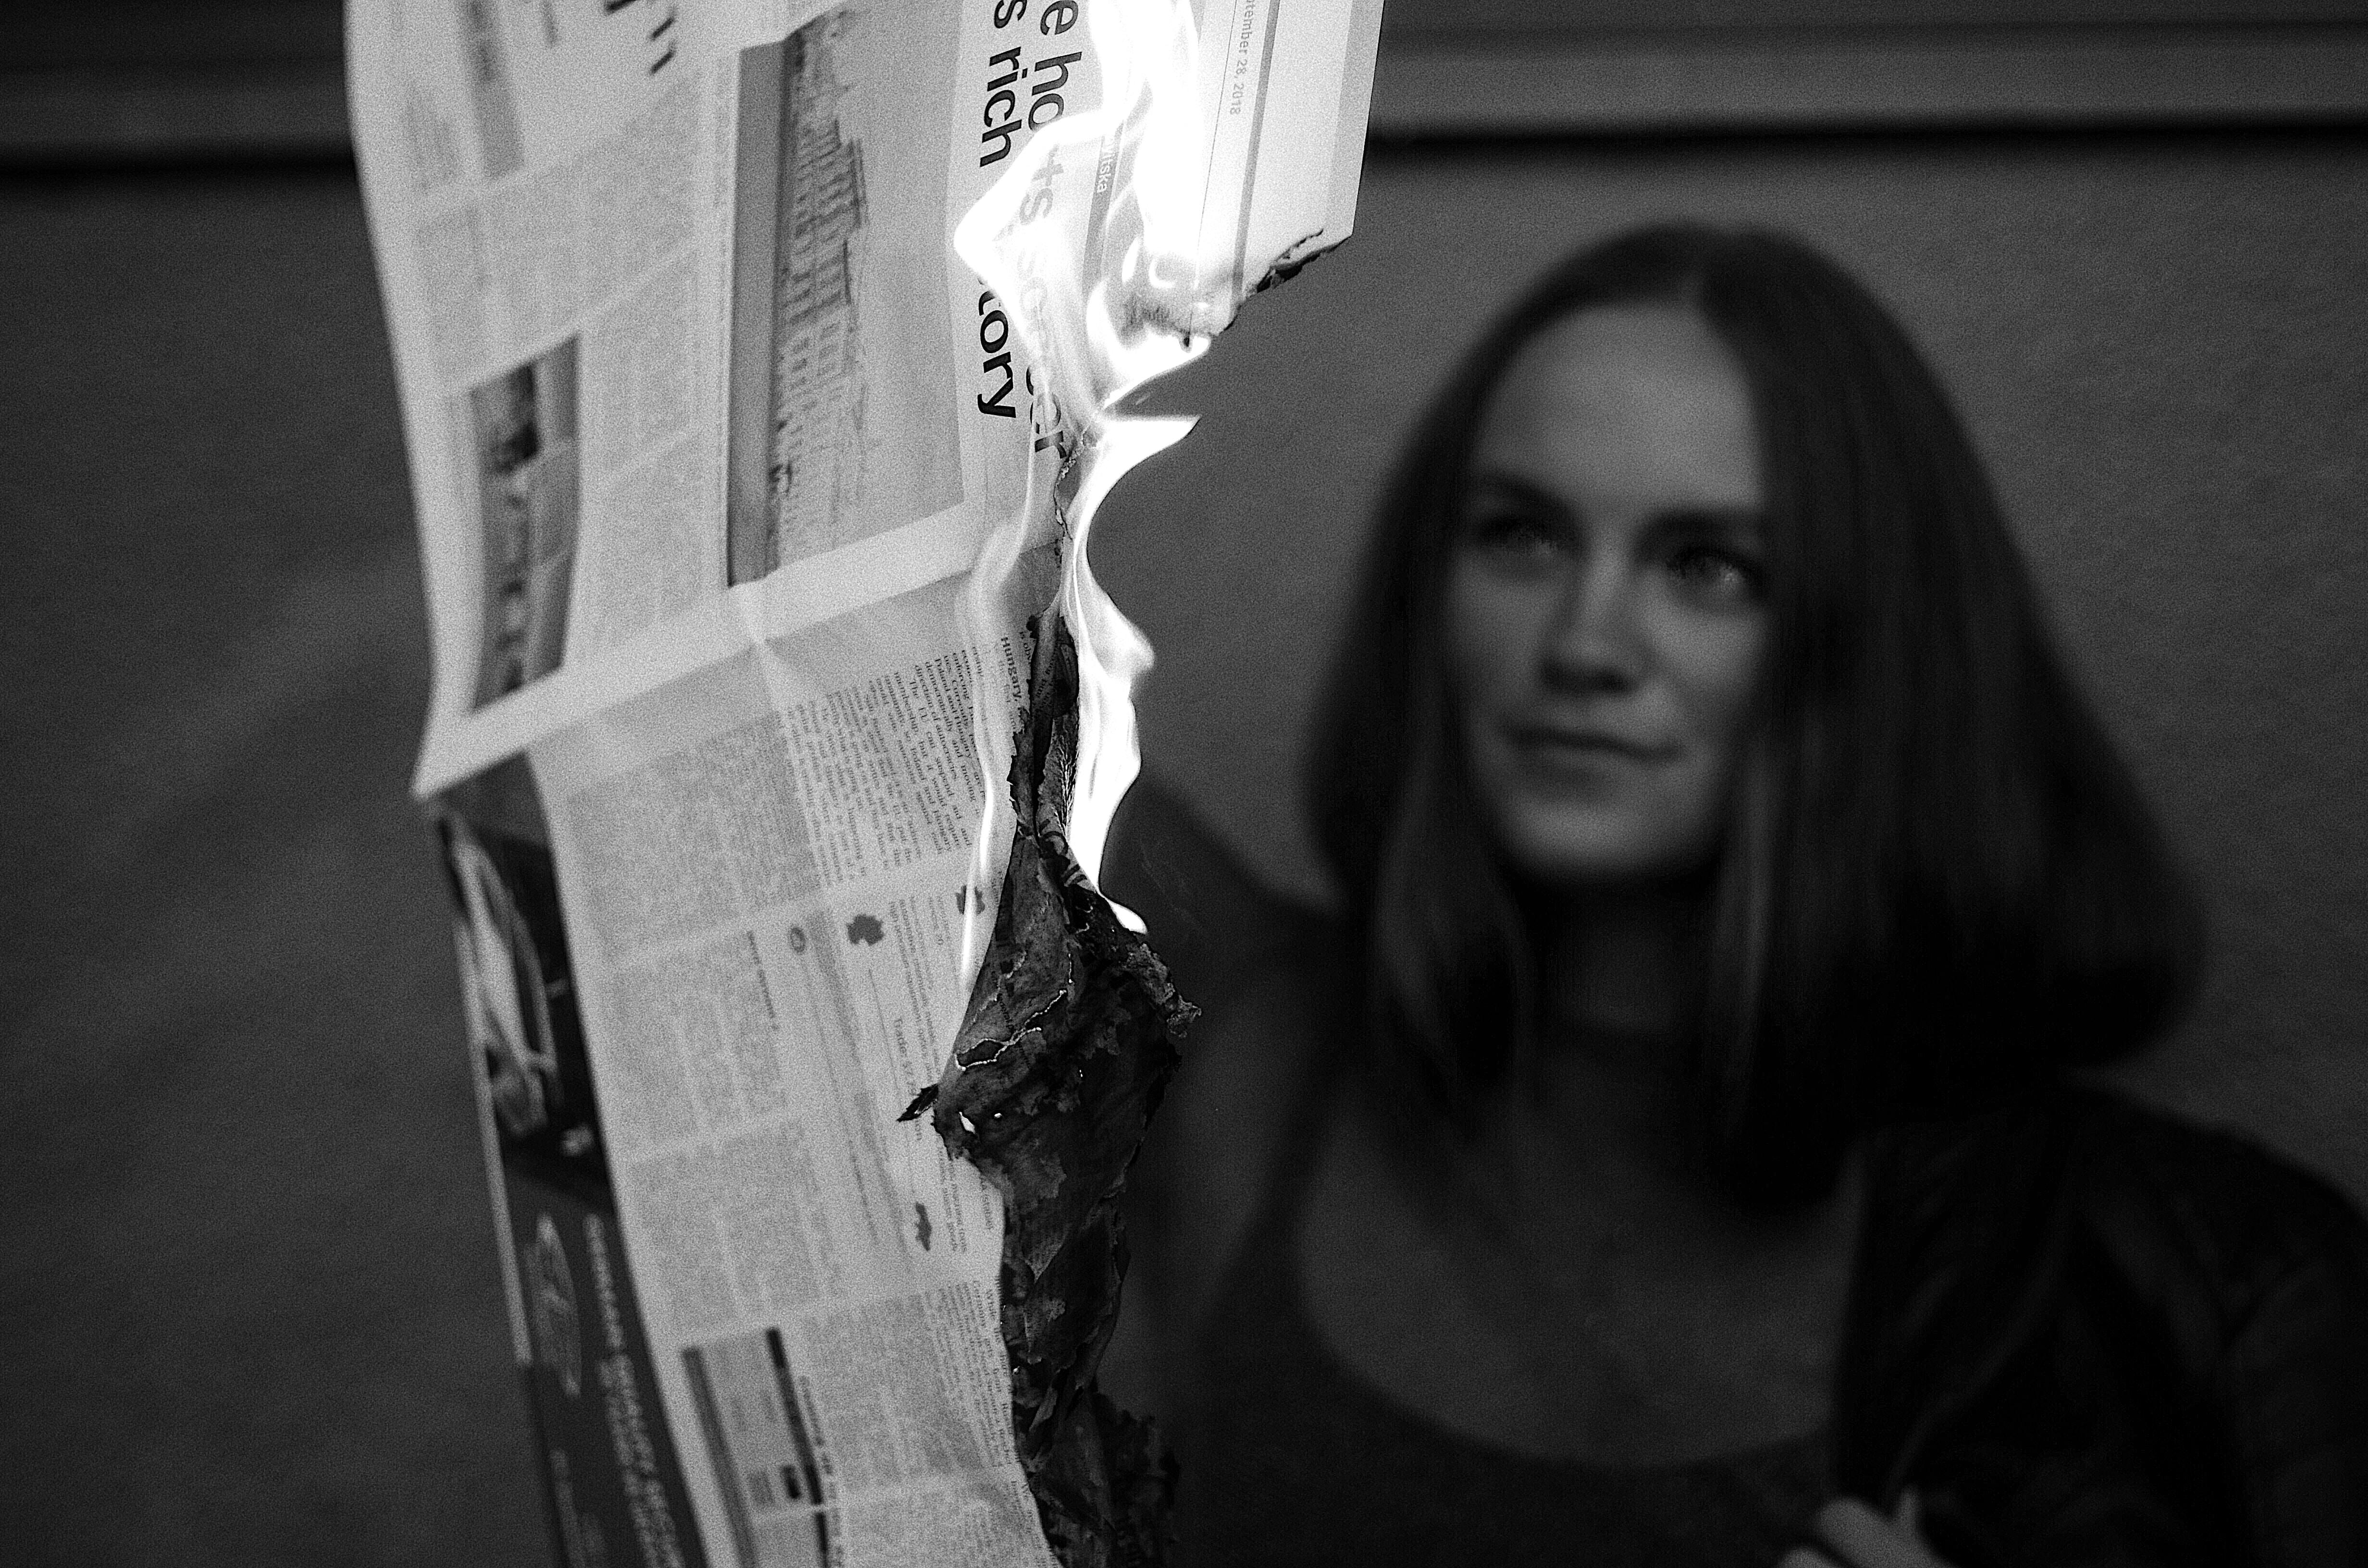 woman burning newspaper